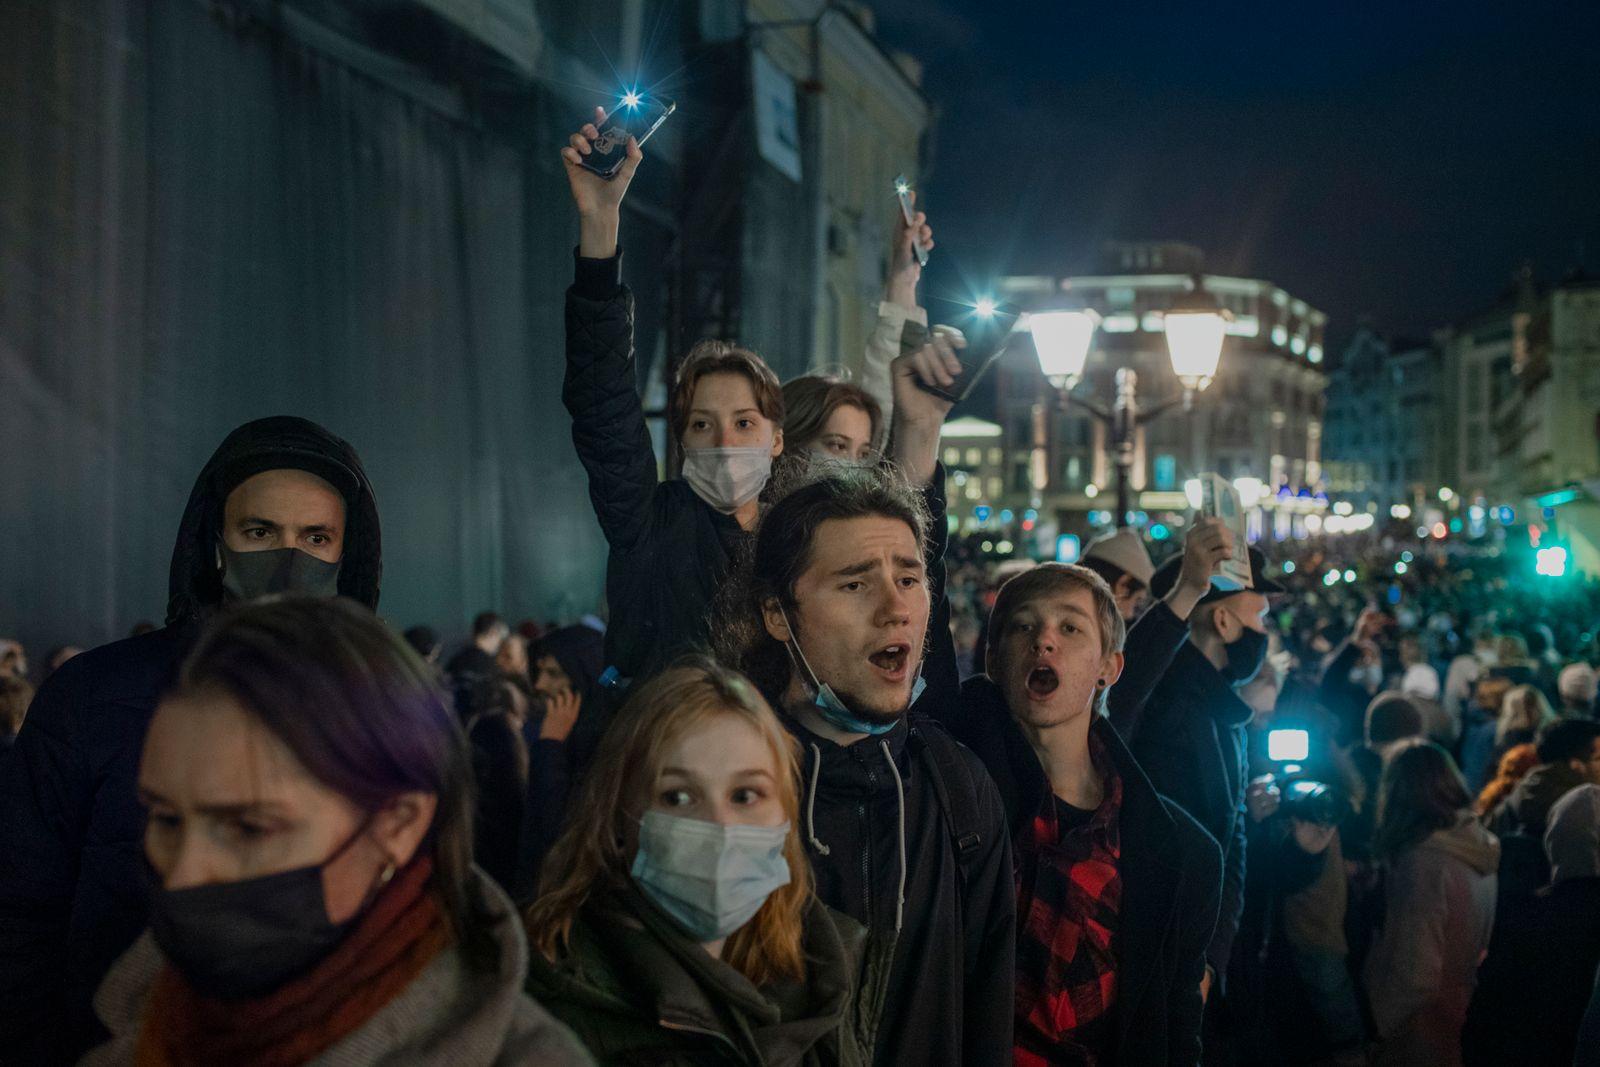 Moskau Protest